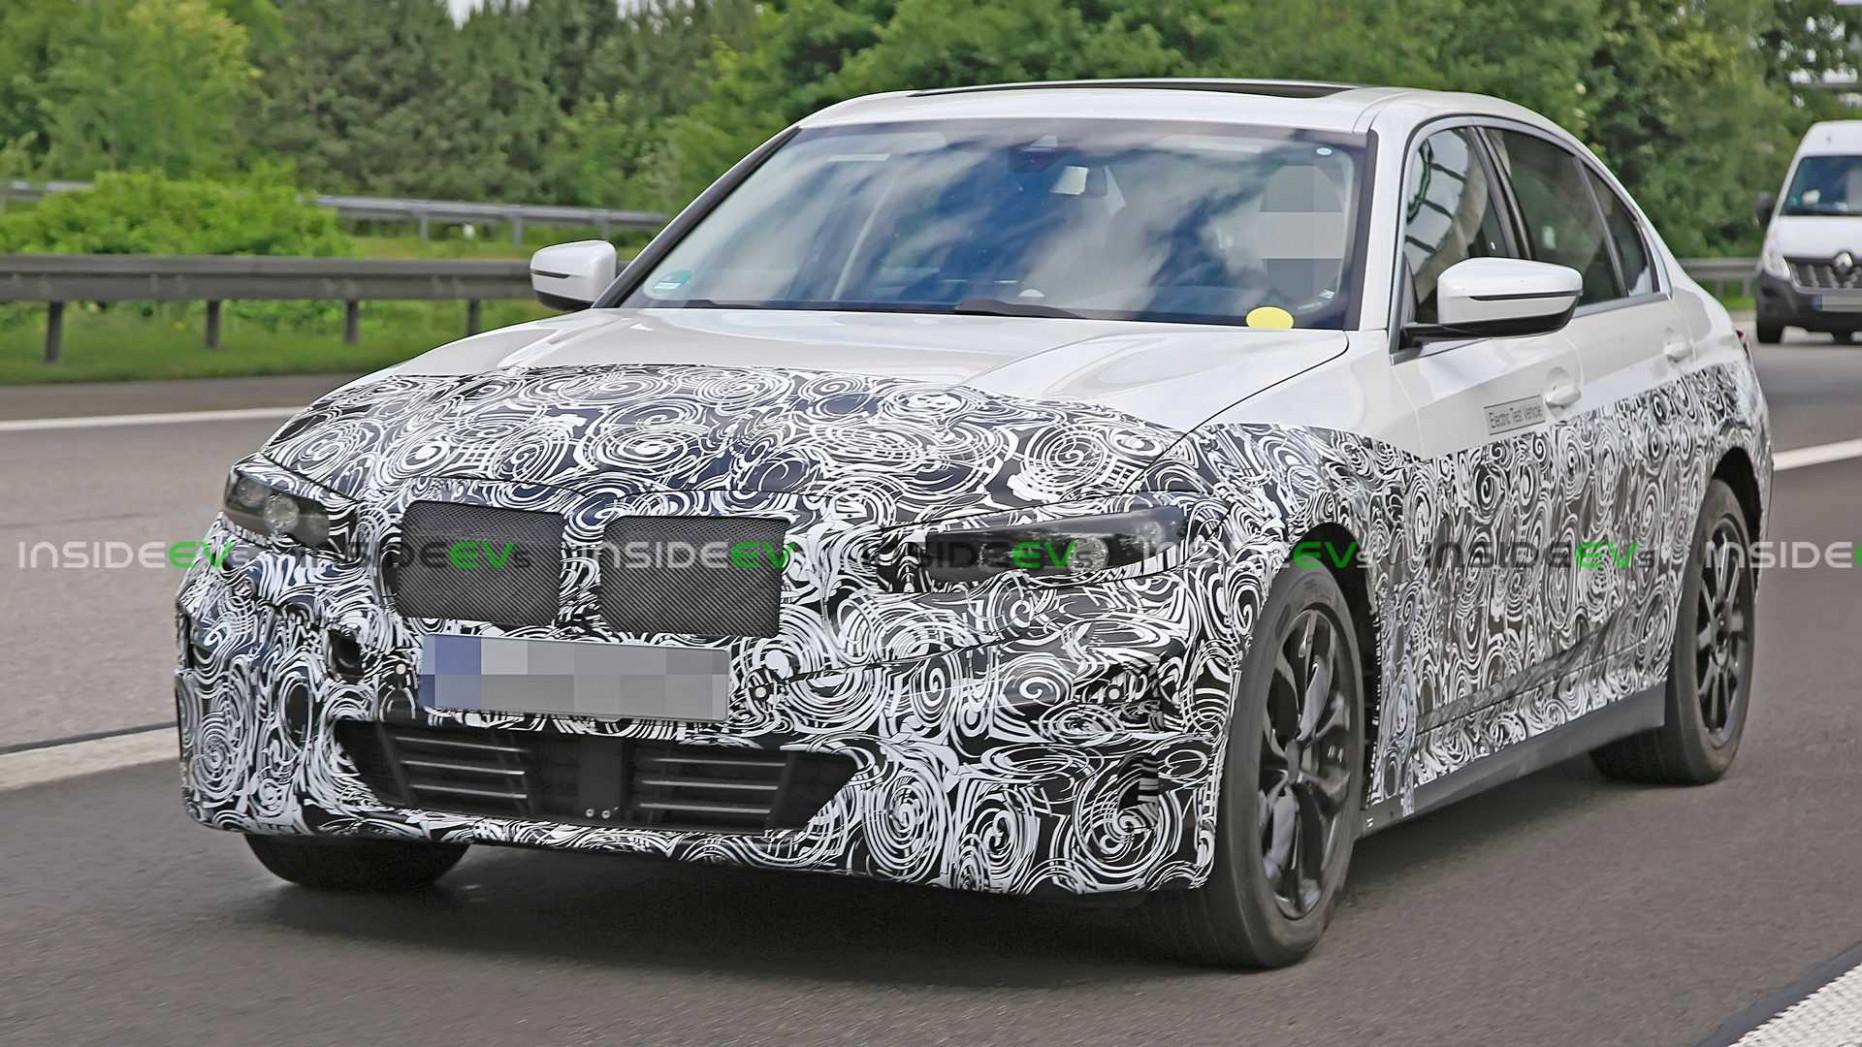 Research New 2022 Spy Shots BMW 3 Series